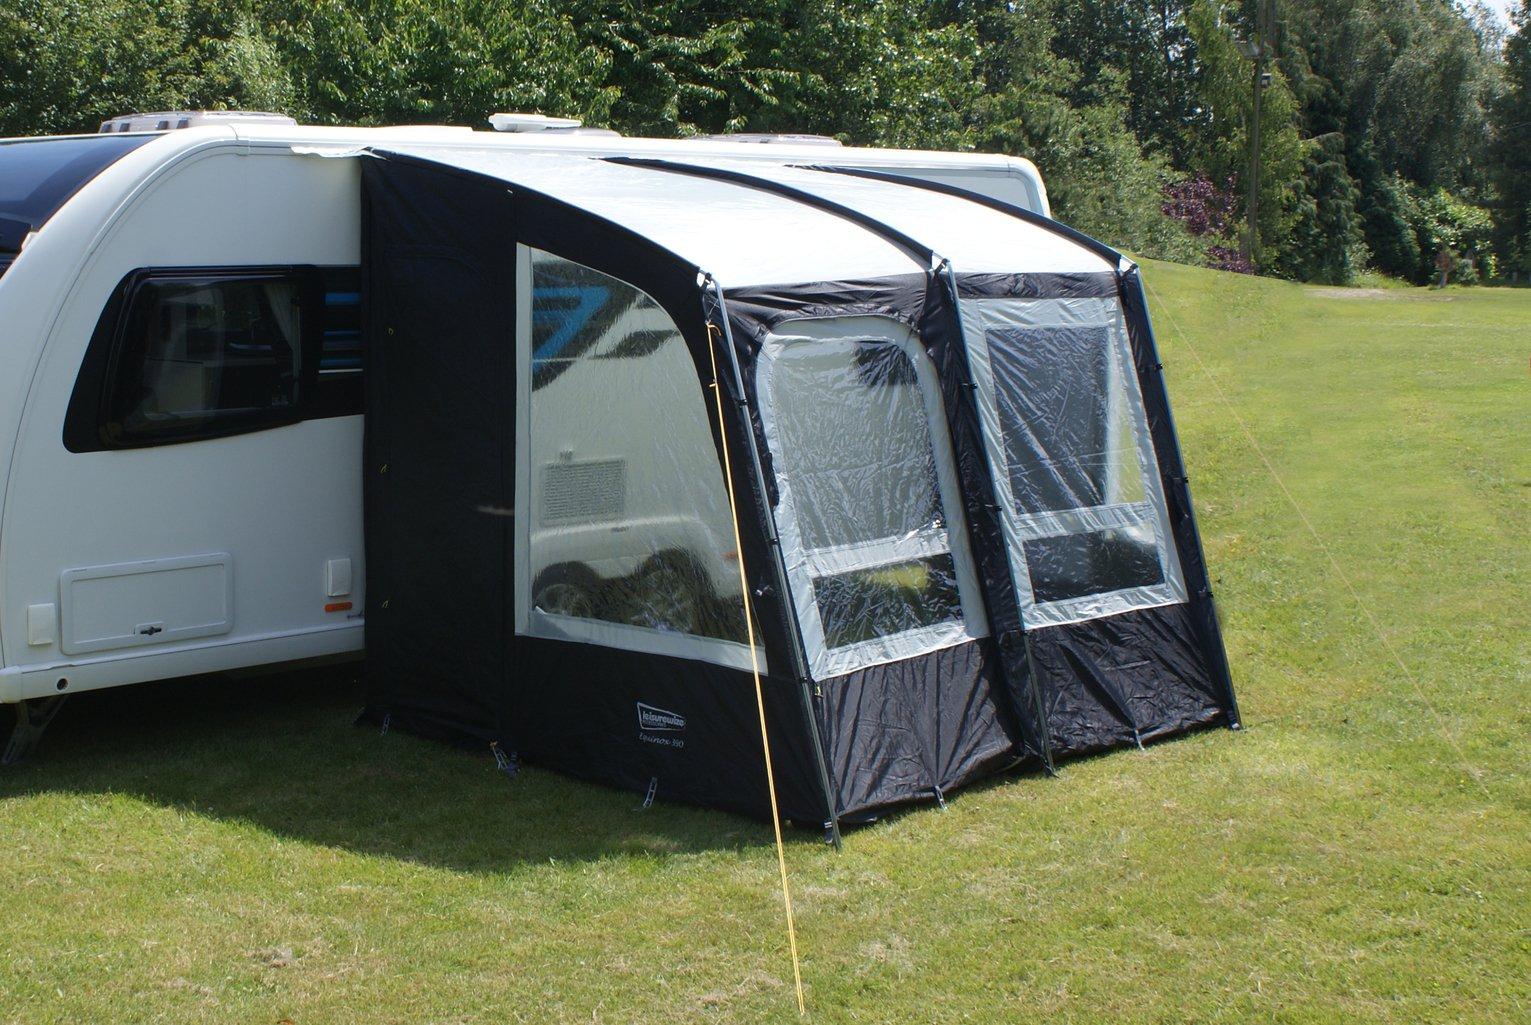 Leisurewize Equinox 260 3 Man Camping Caravan Porch Awning